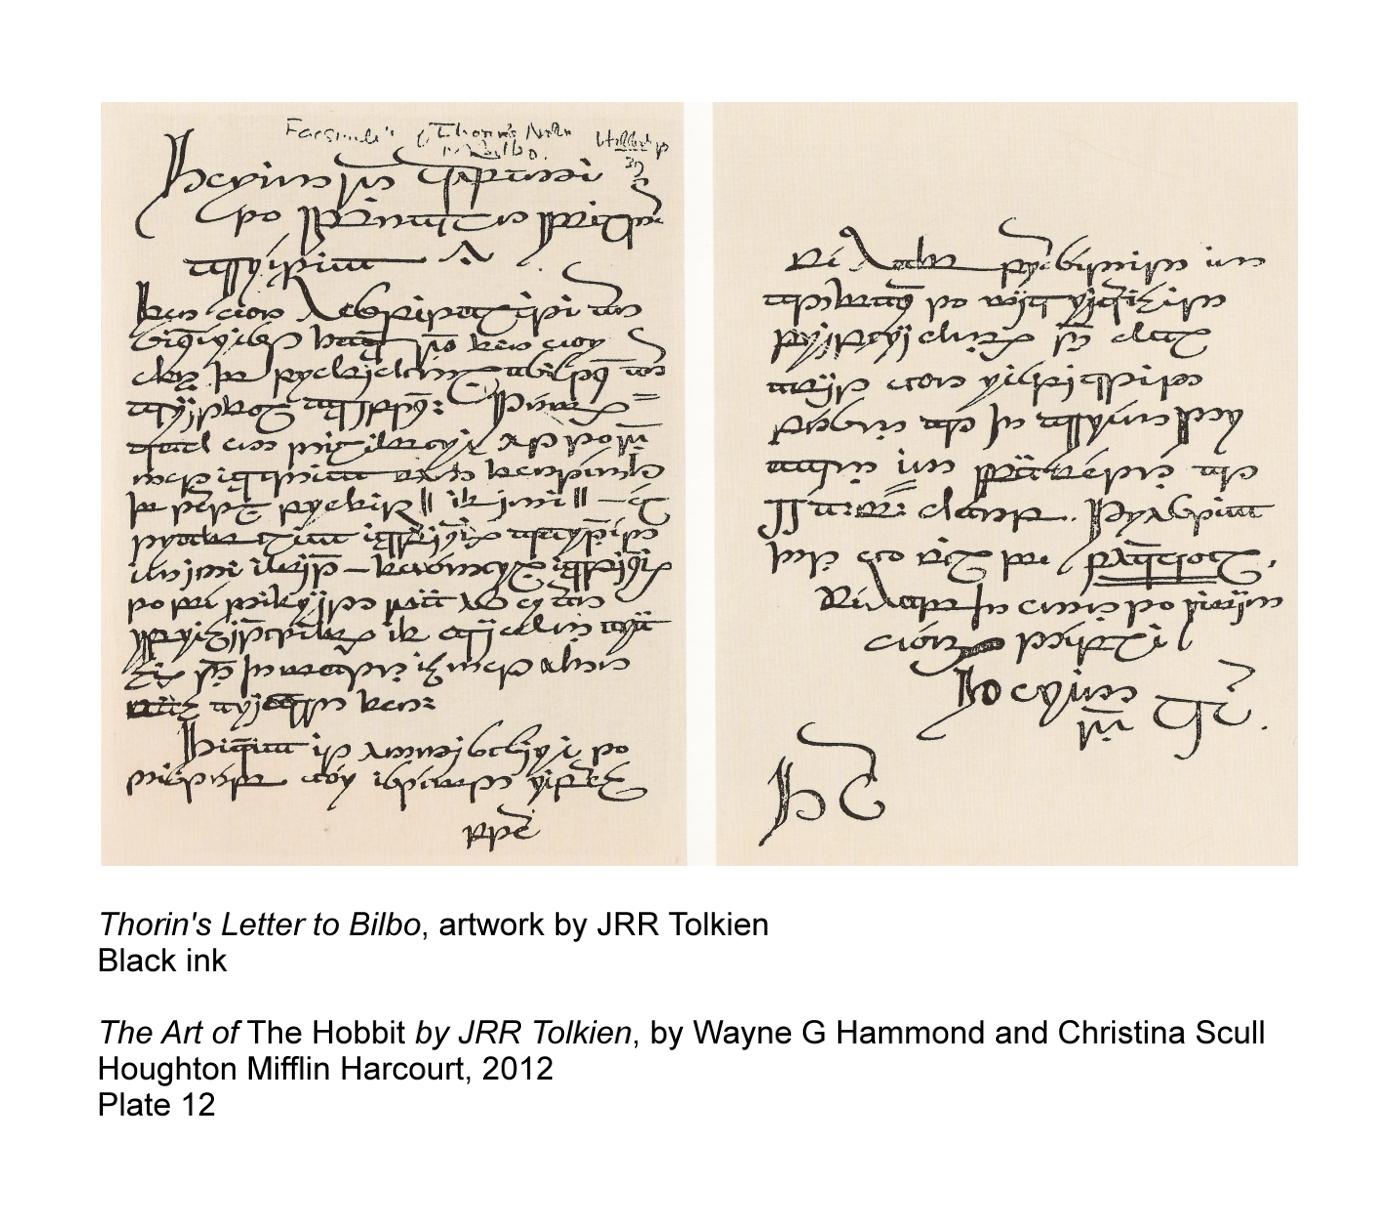 thorin u0026 39 s letter to bilbo - things